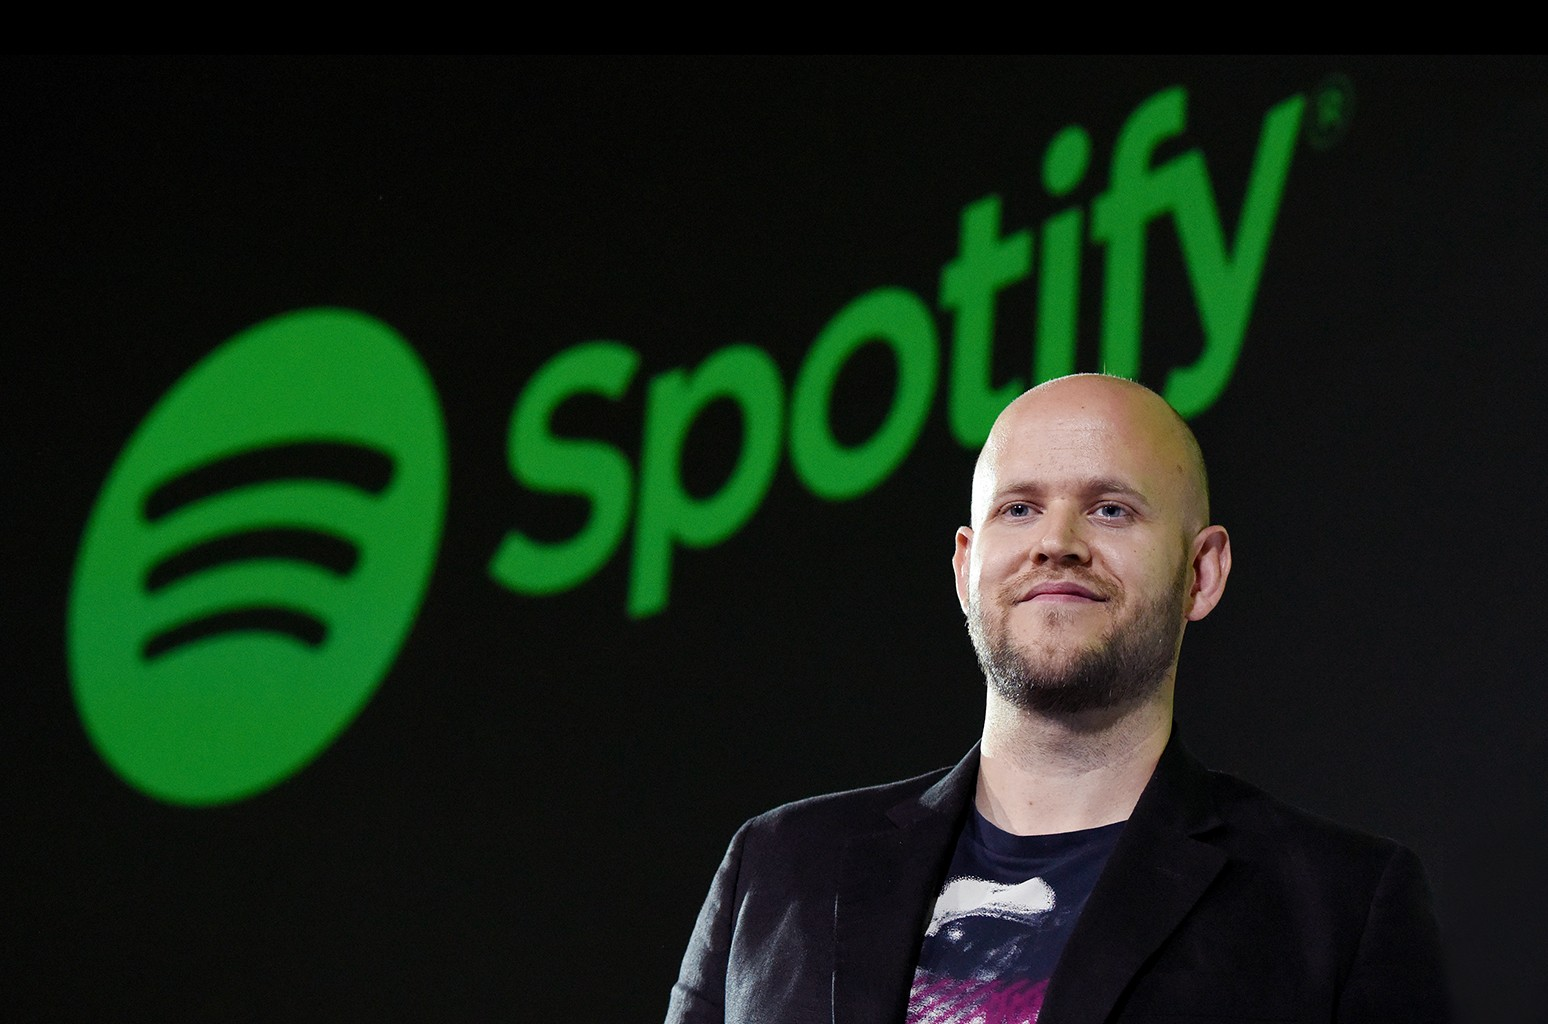 Daniel Ek, Spotify Co-Founder/CEO